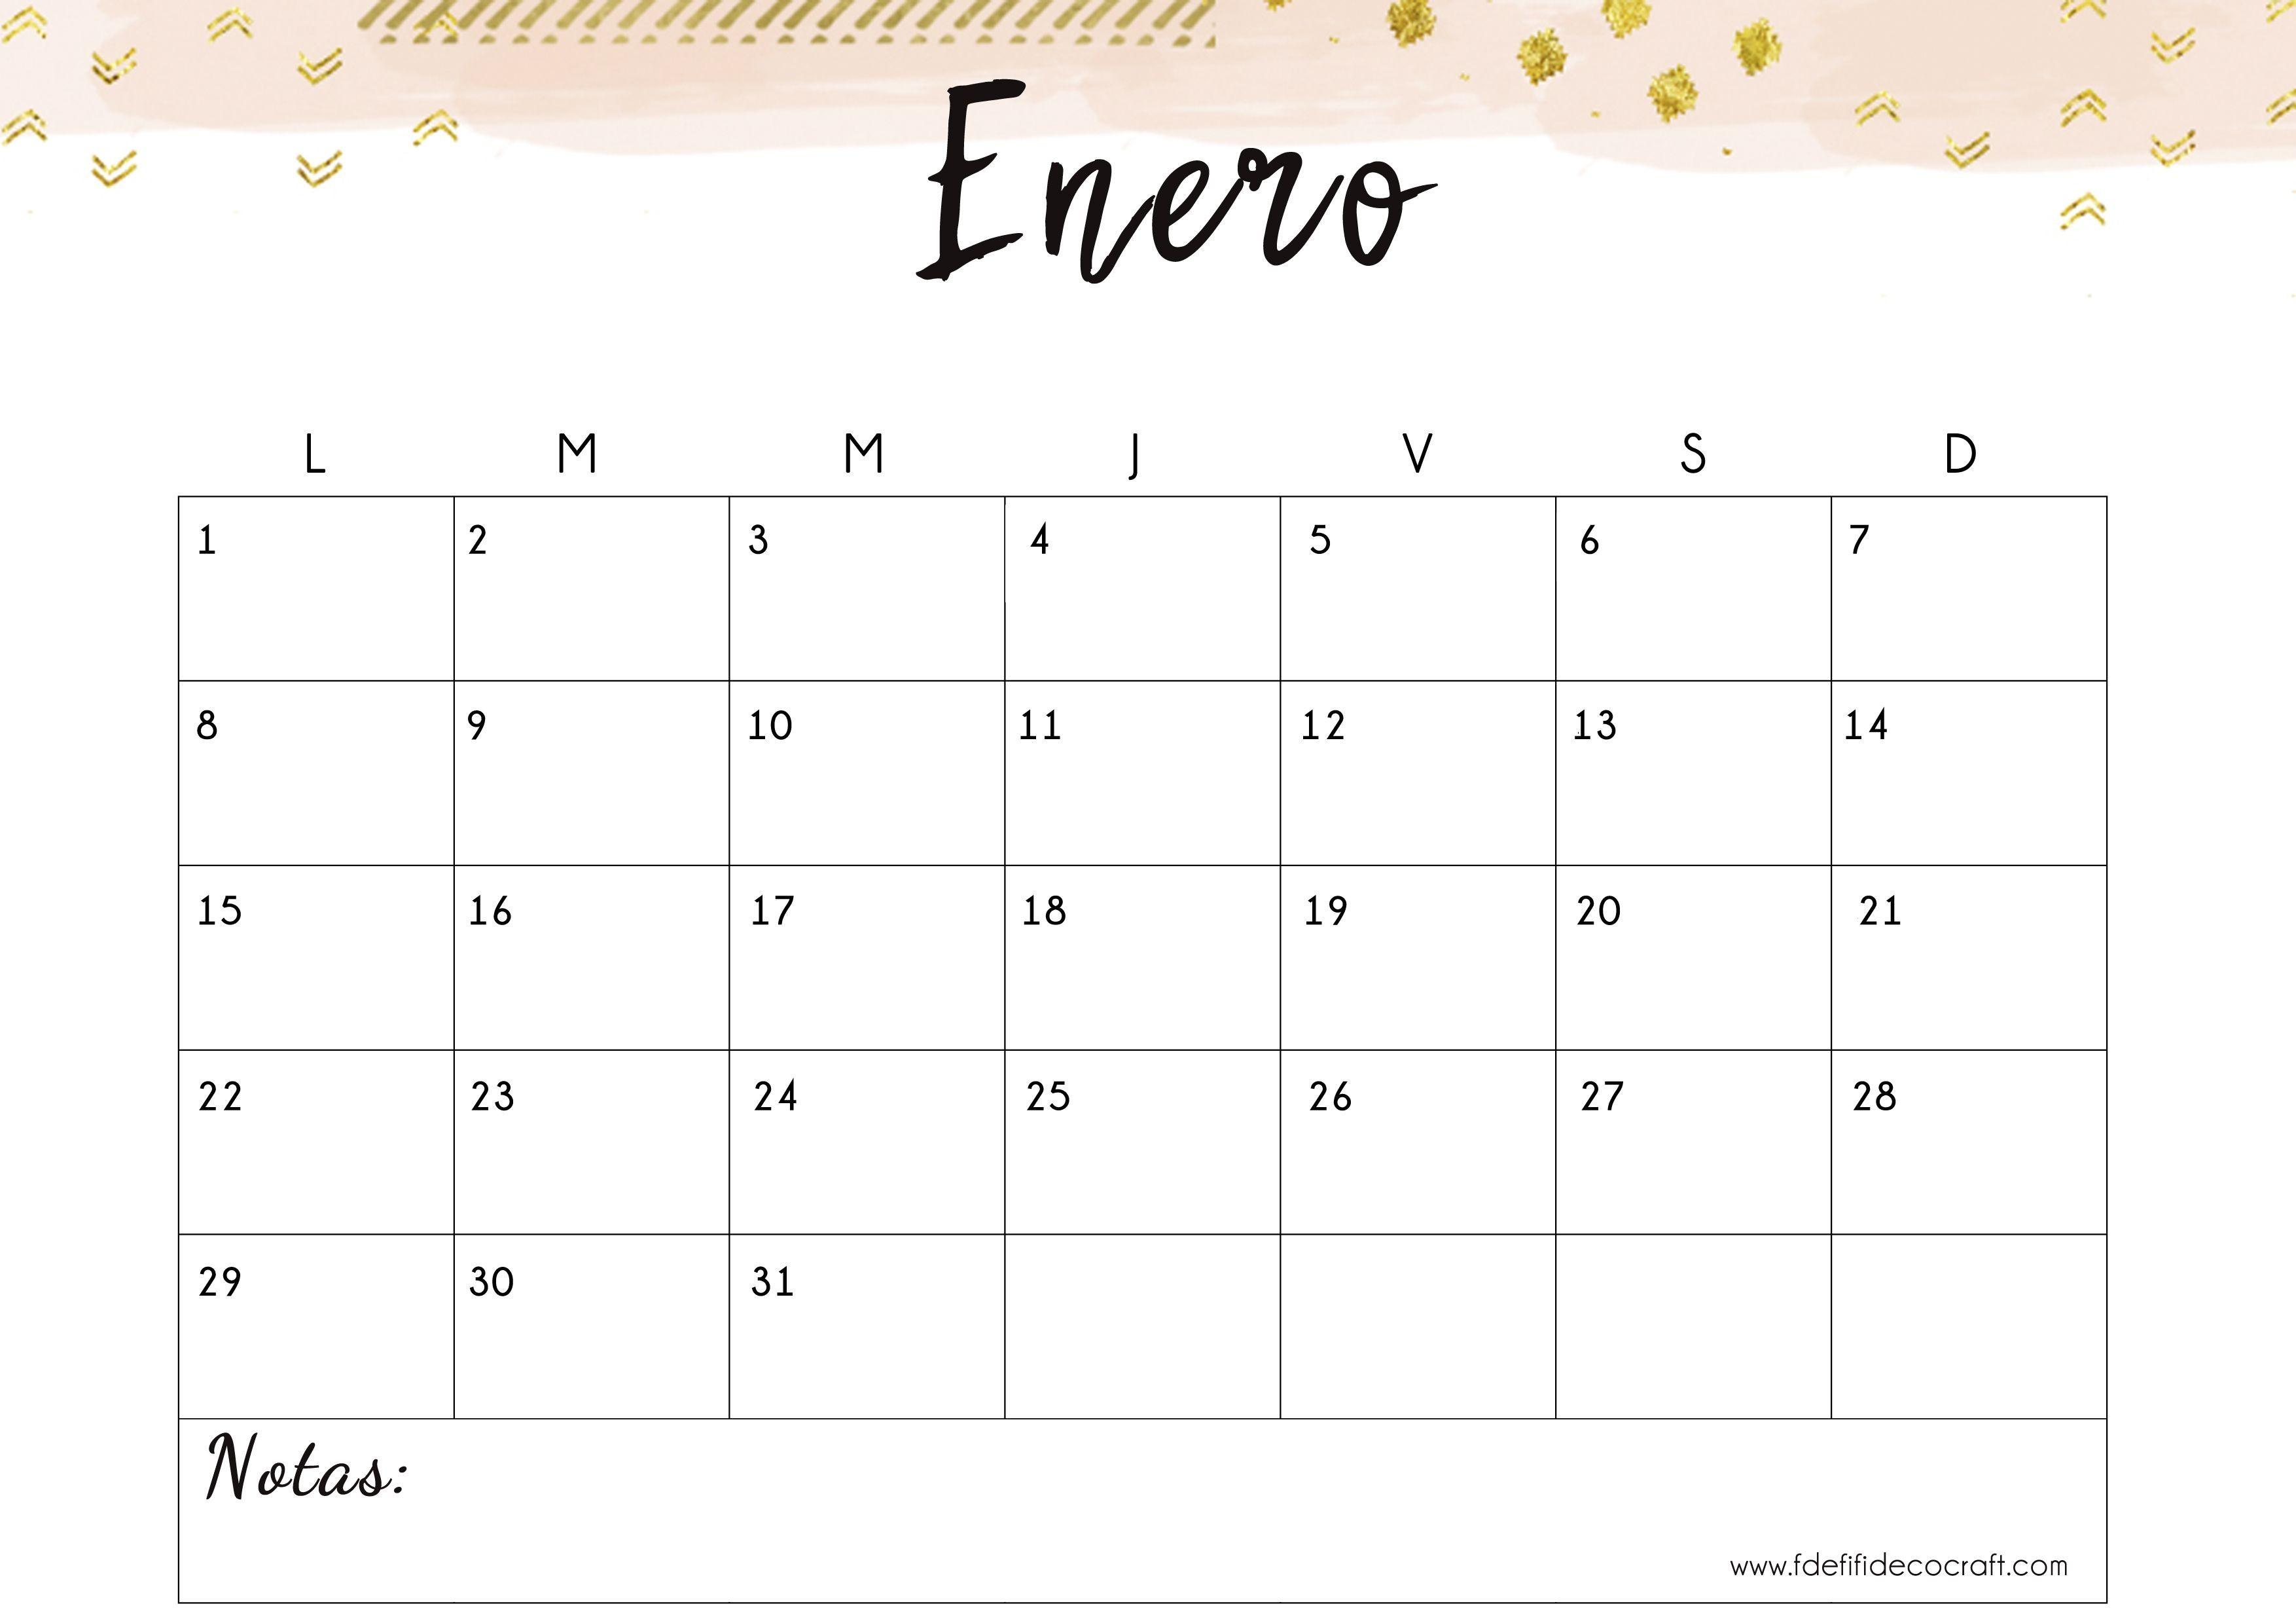 Calendario enero para imprimir gratis imprimible descargable 3508x2479 Imprimir moorddiner calendario 2017 por mes